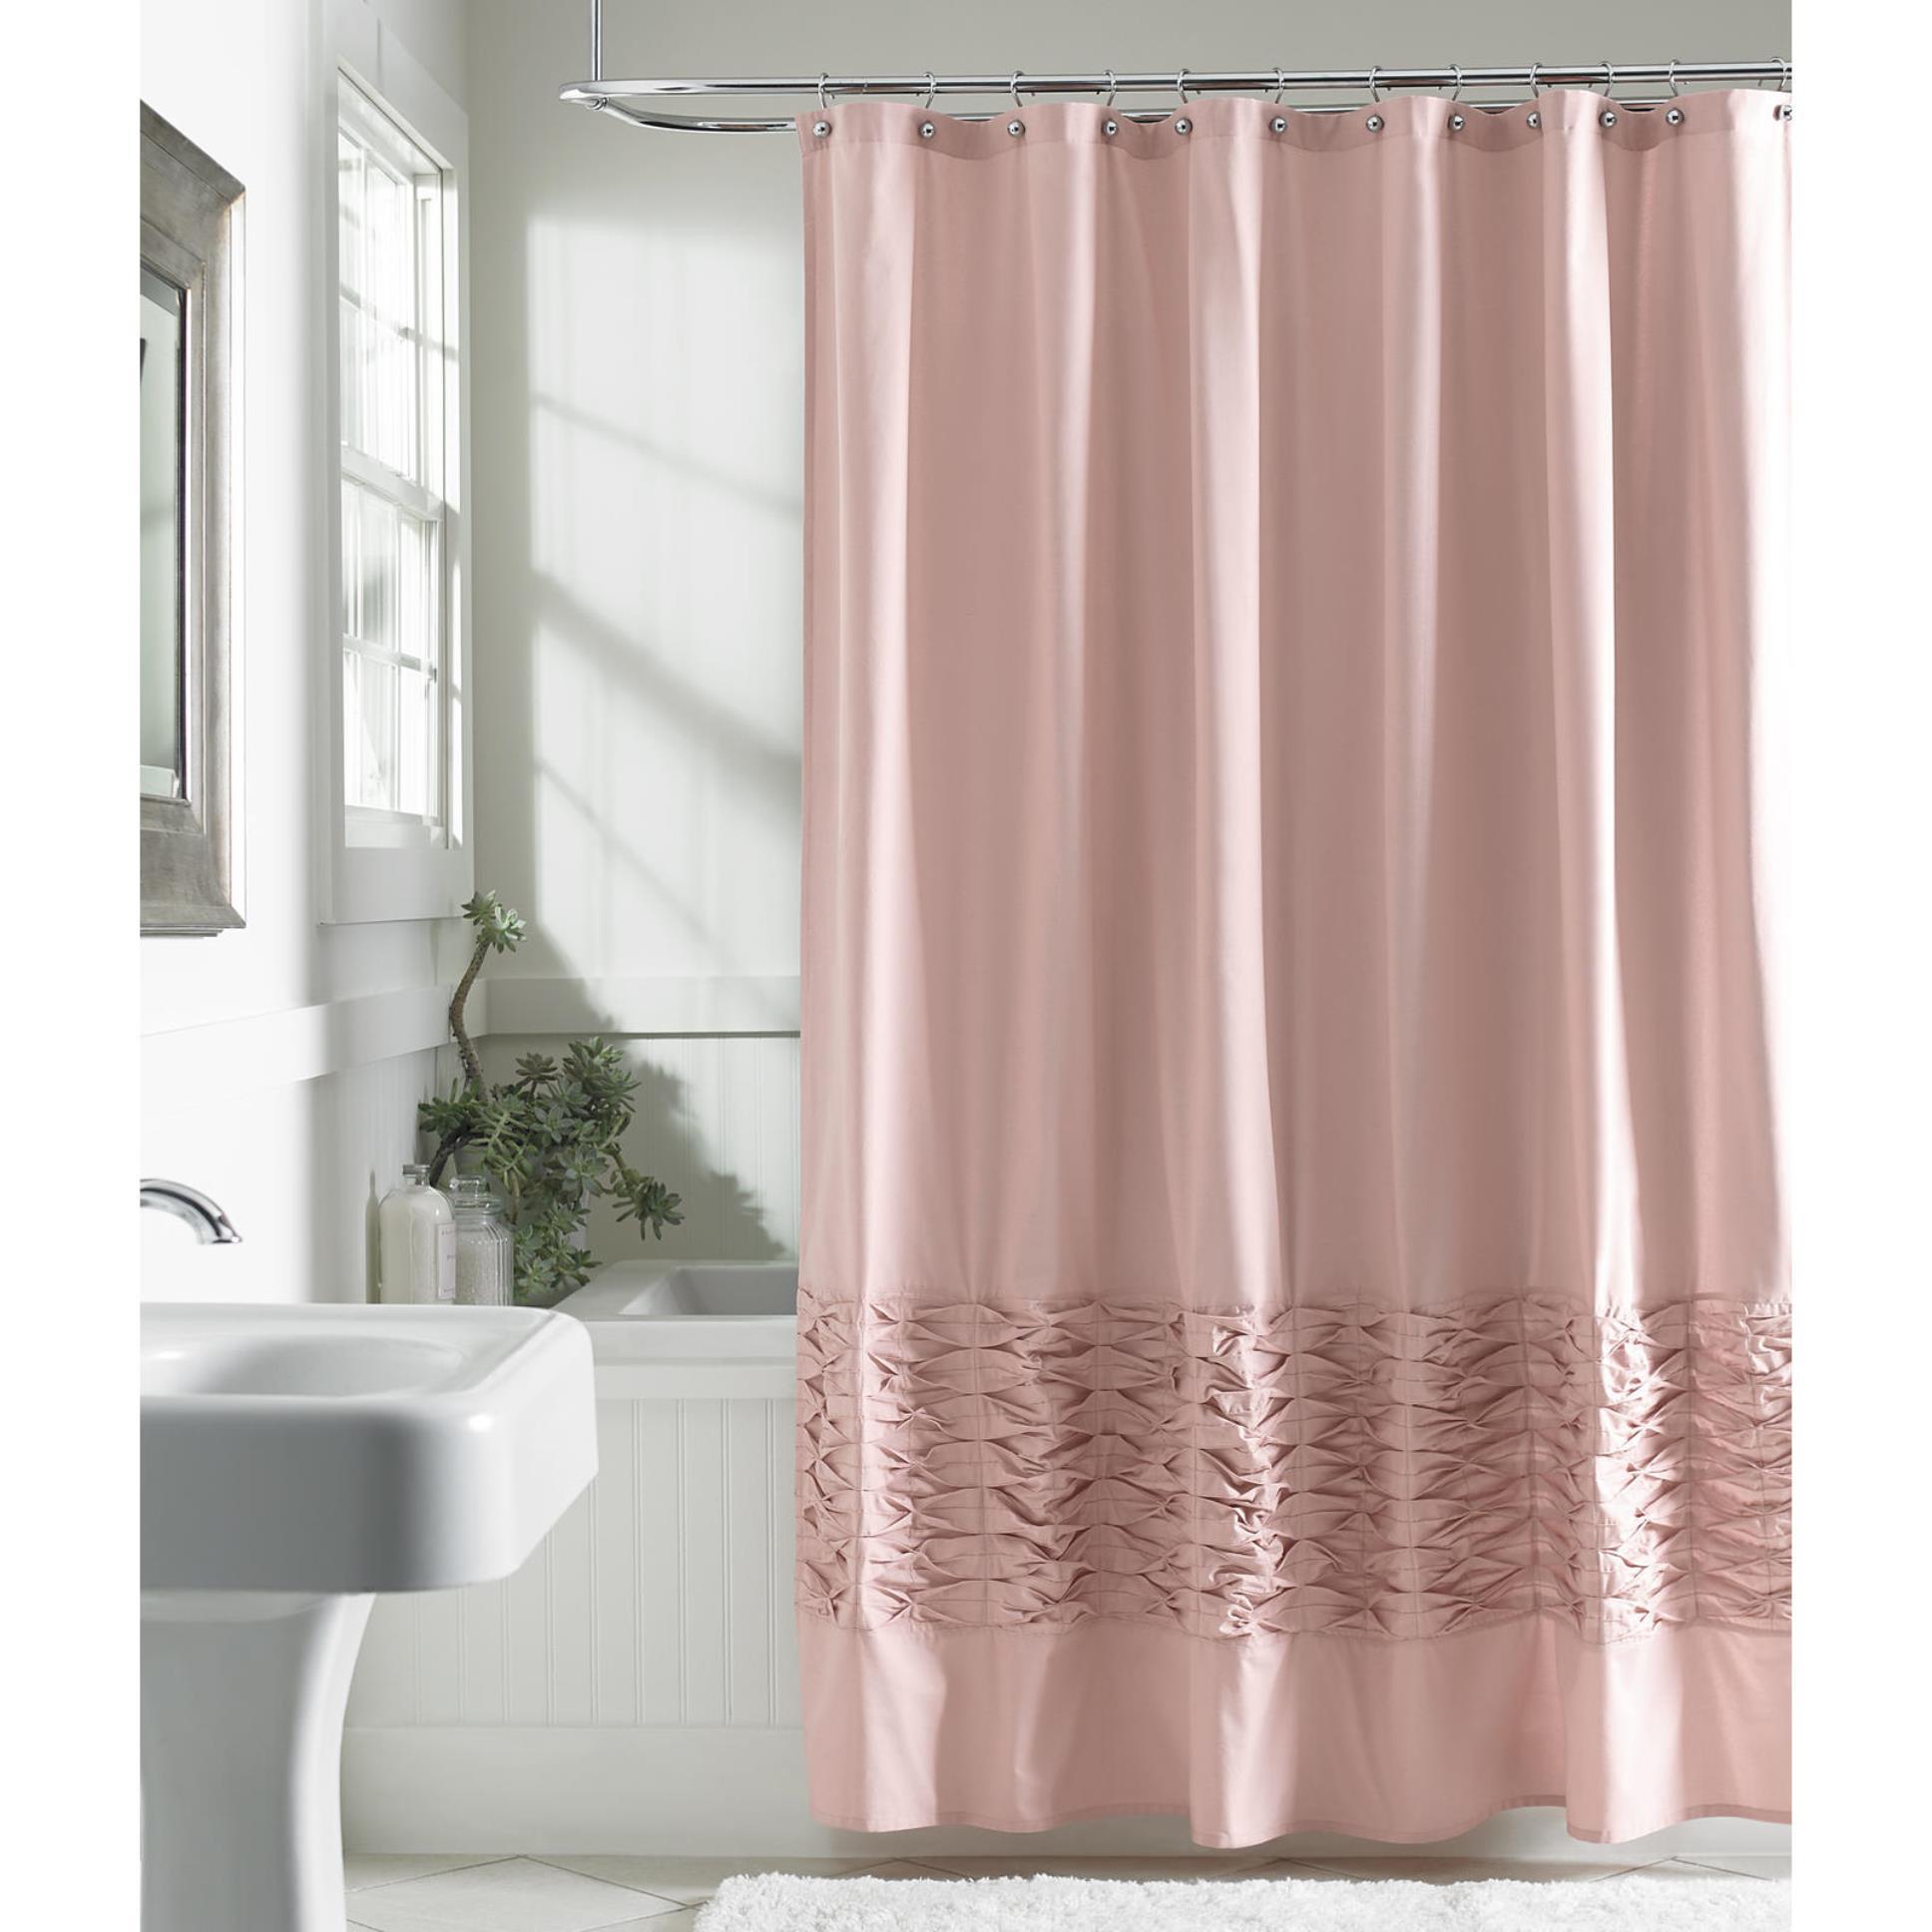 Metaphor Fabric Shower Curtain Blush